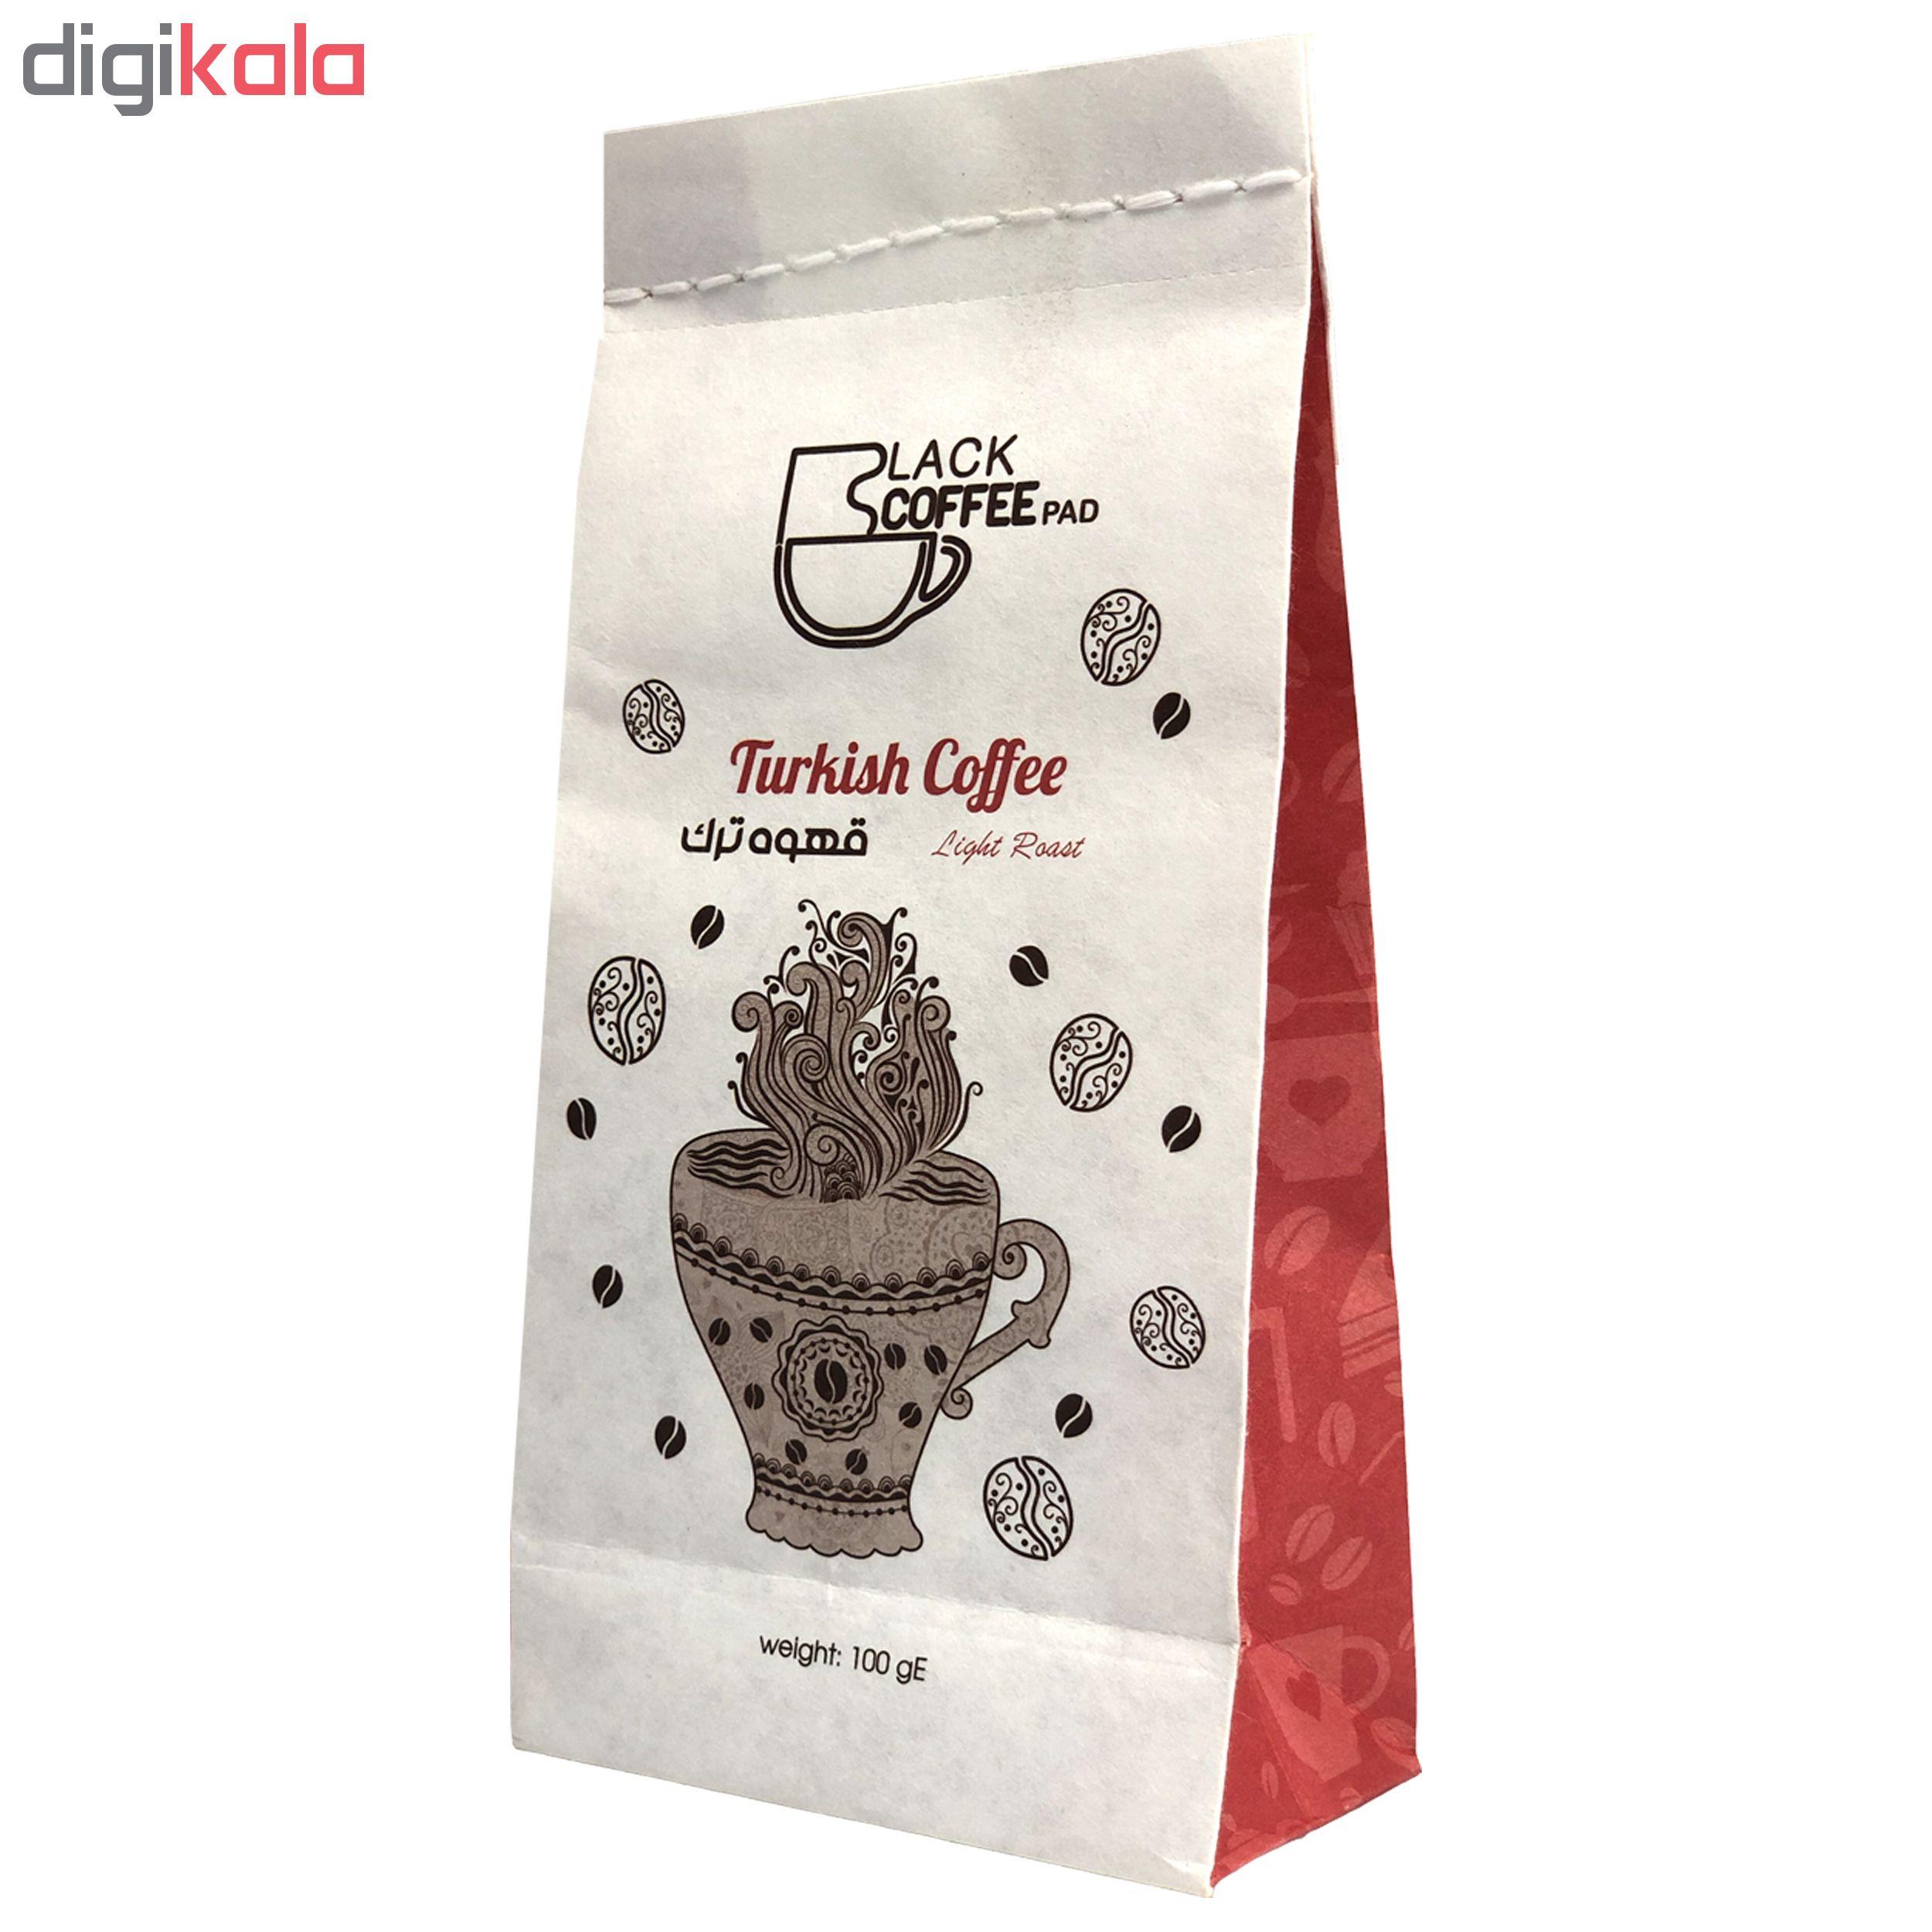 قهوه ترک لایت بلک کافی کد Tl16 مقدار 100 گرم